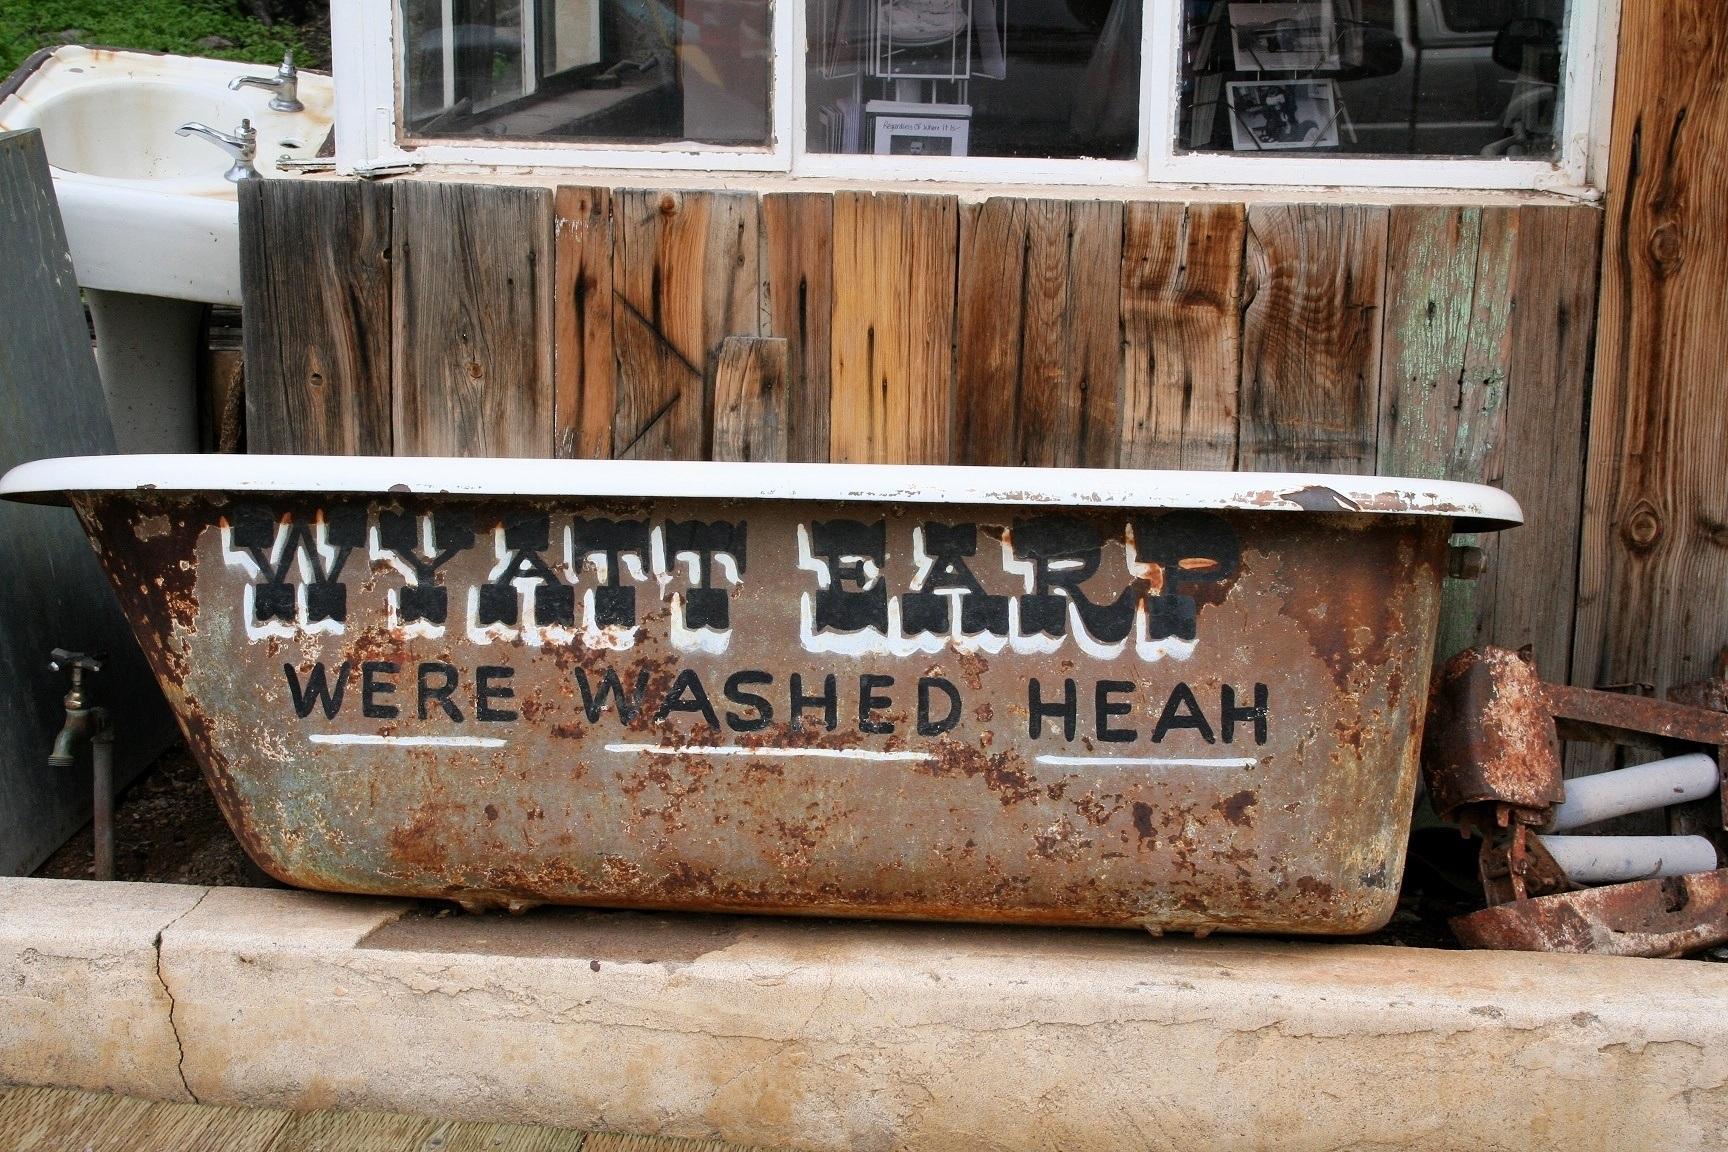 Wyatt Earp bathtub